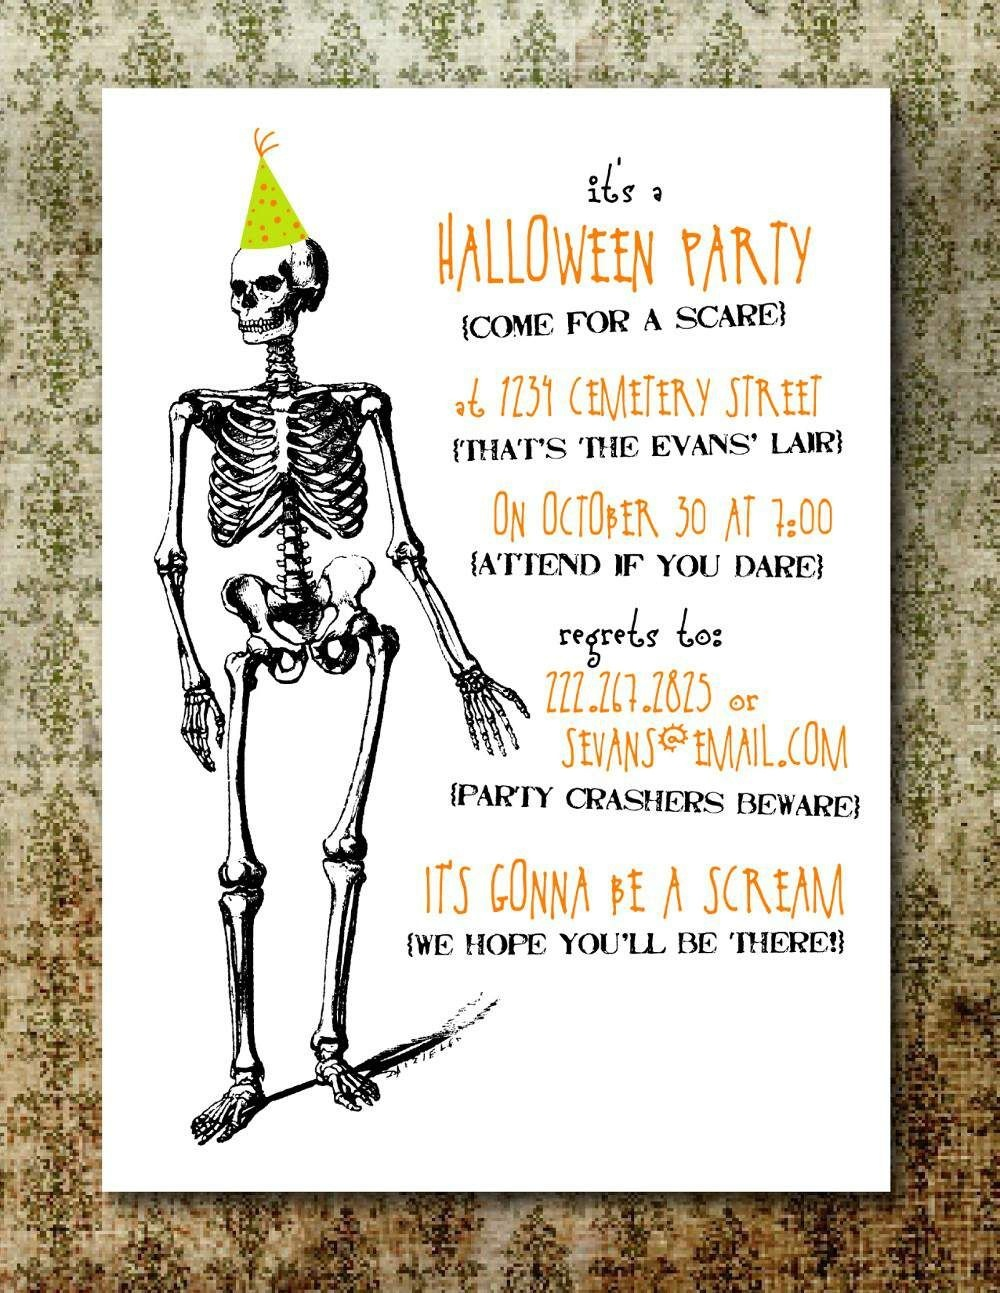 Free Printable Halloween Invitation Templates | Free Printable - Free Printable Halloween Invitations